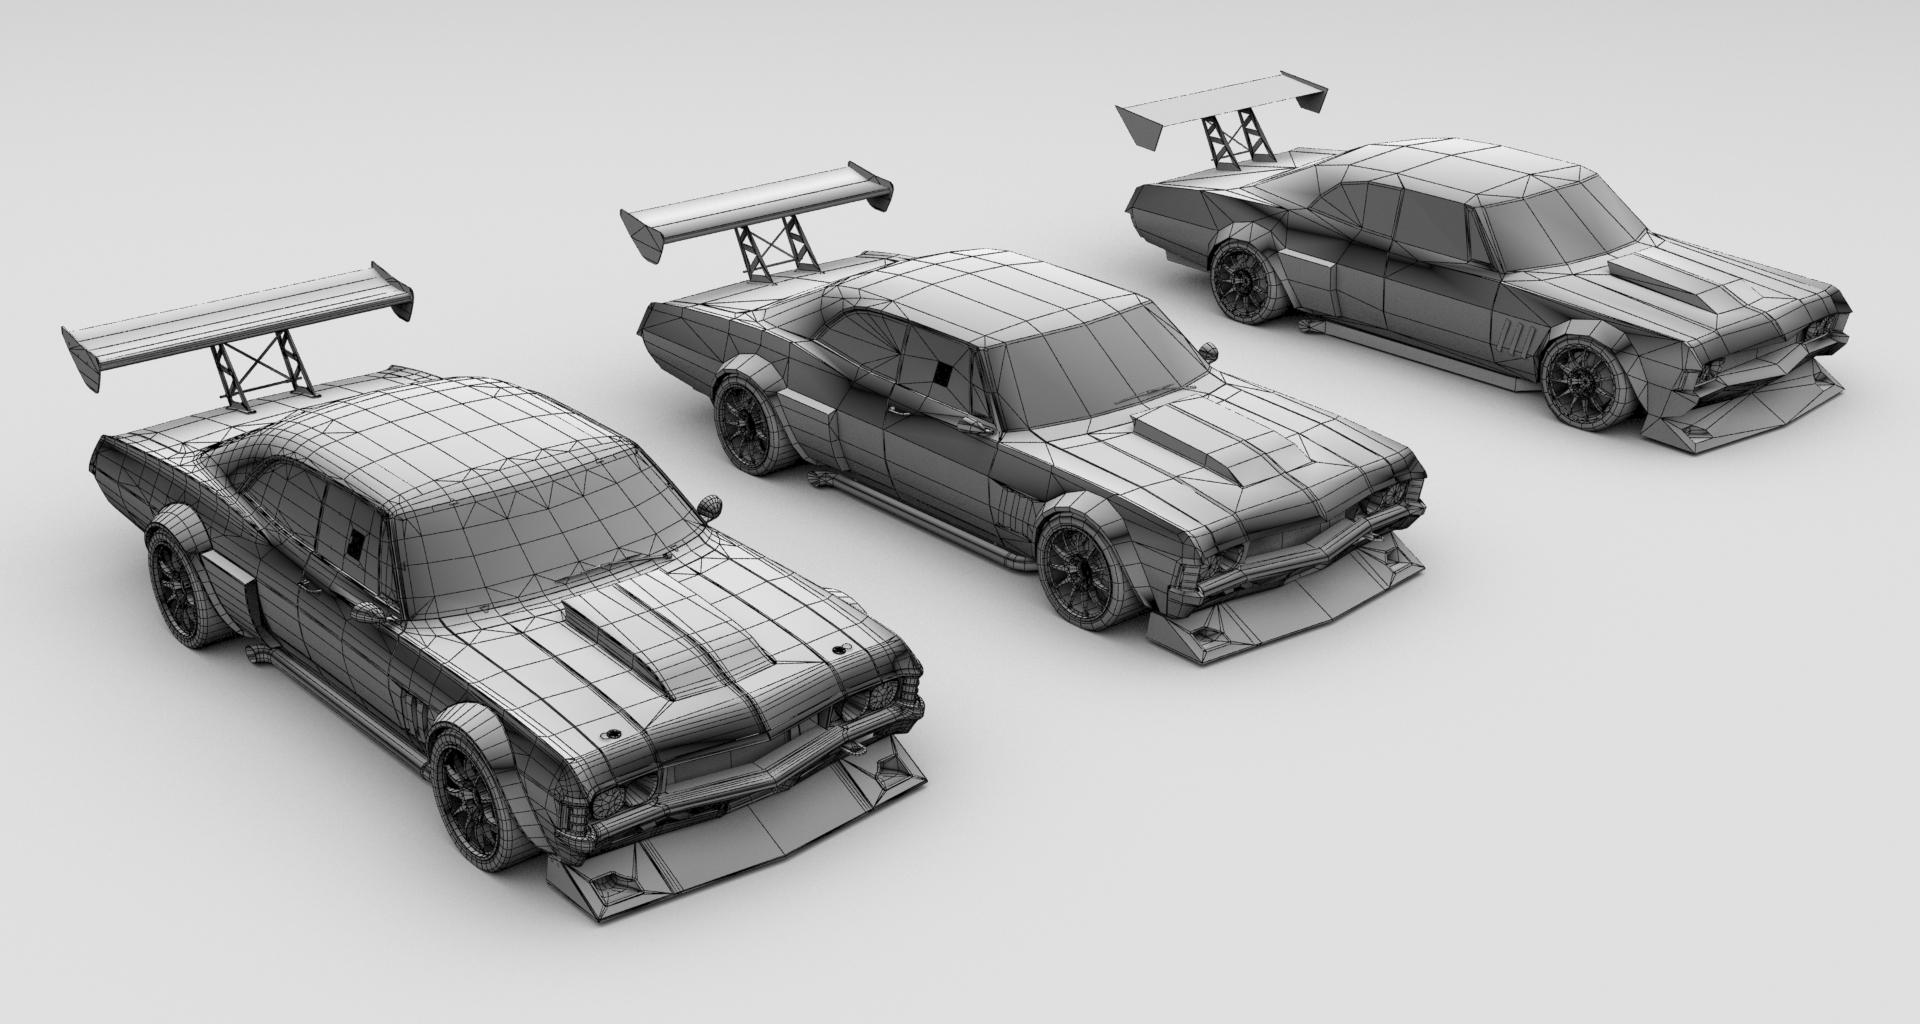 2013-03_The Crew_F.Beudin_Chevrolet Impala-1967-Racing_AO-LOD